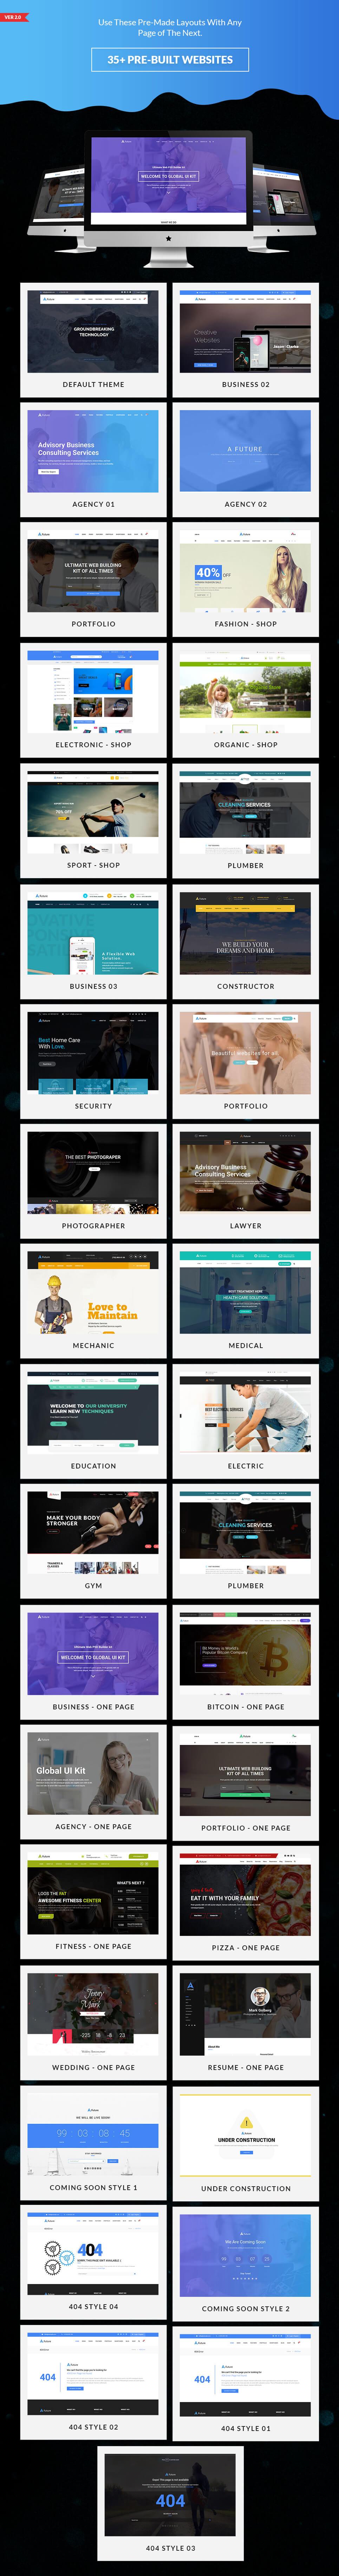 35 Premade Template Previews In Next Web Design Kit